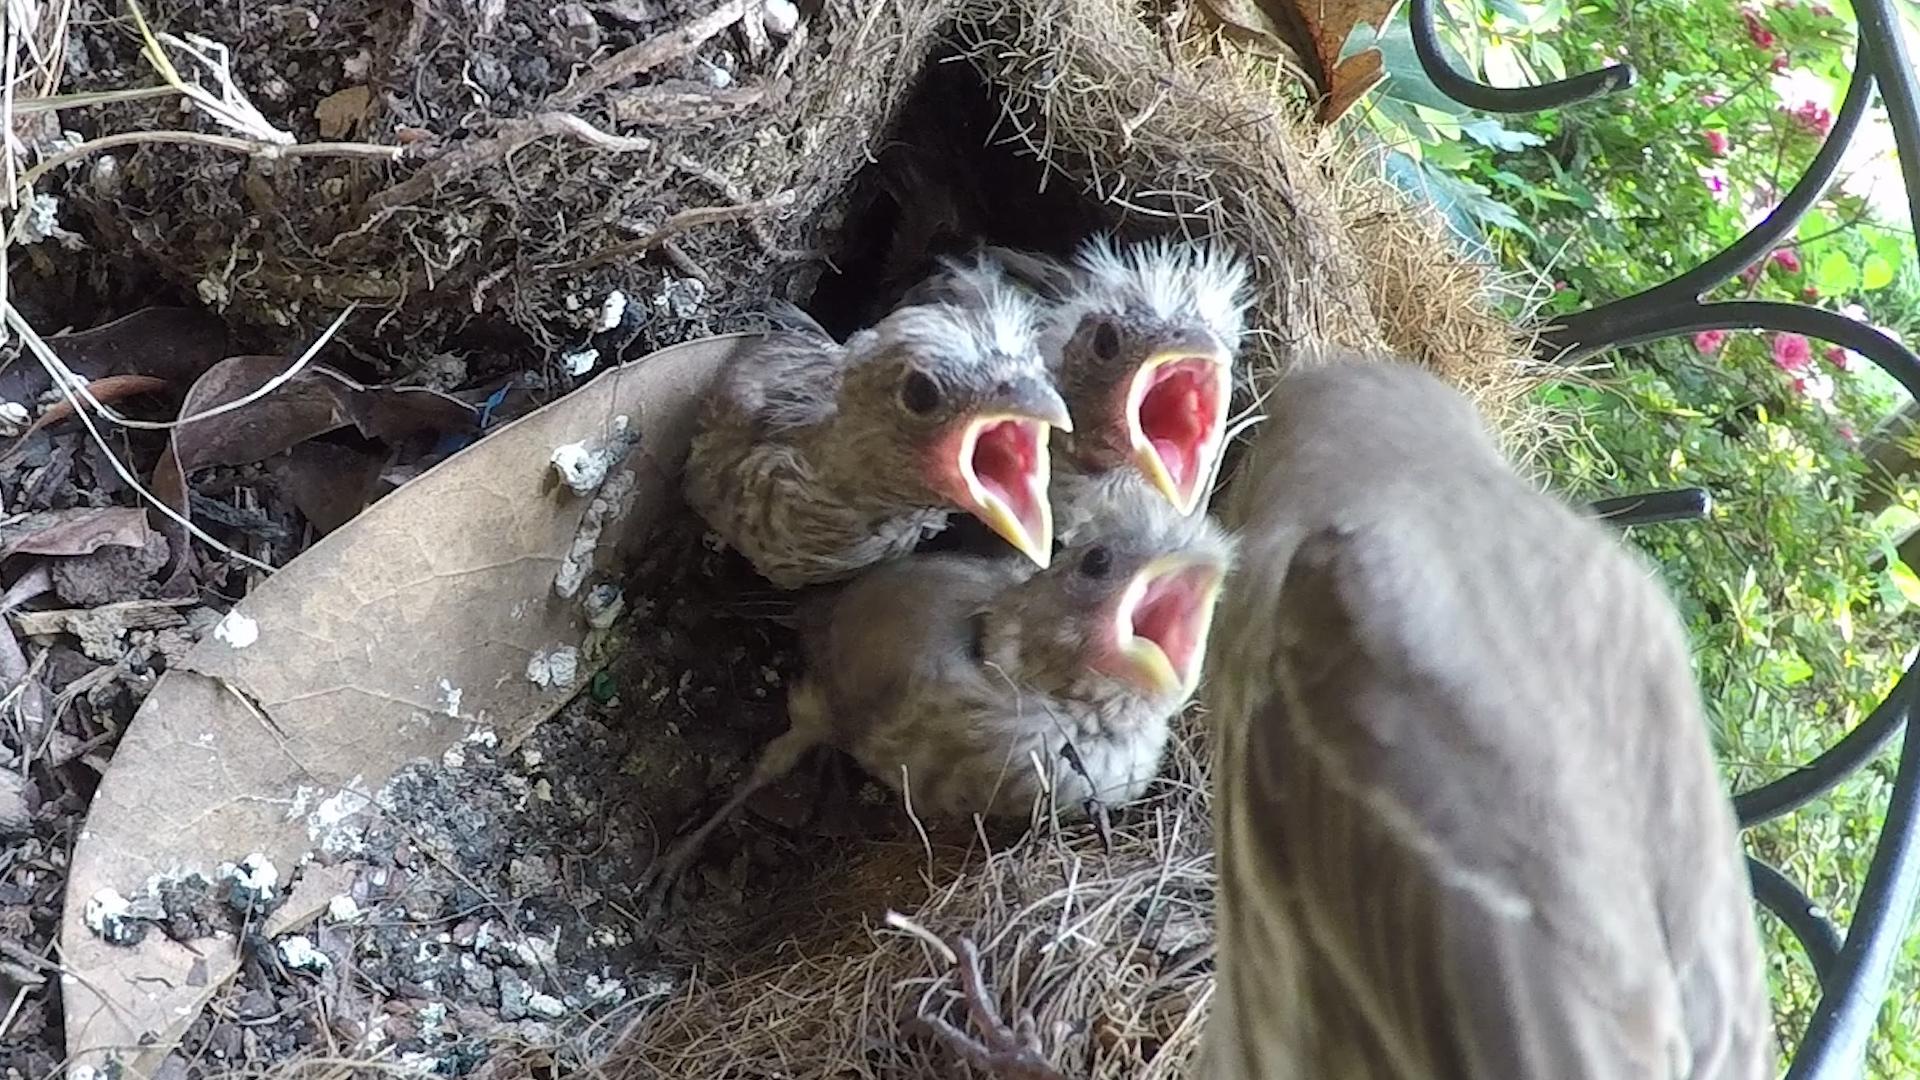 jim west collierville tn nature and wildlife finch feeding baby birds